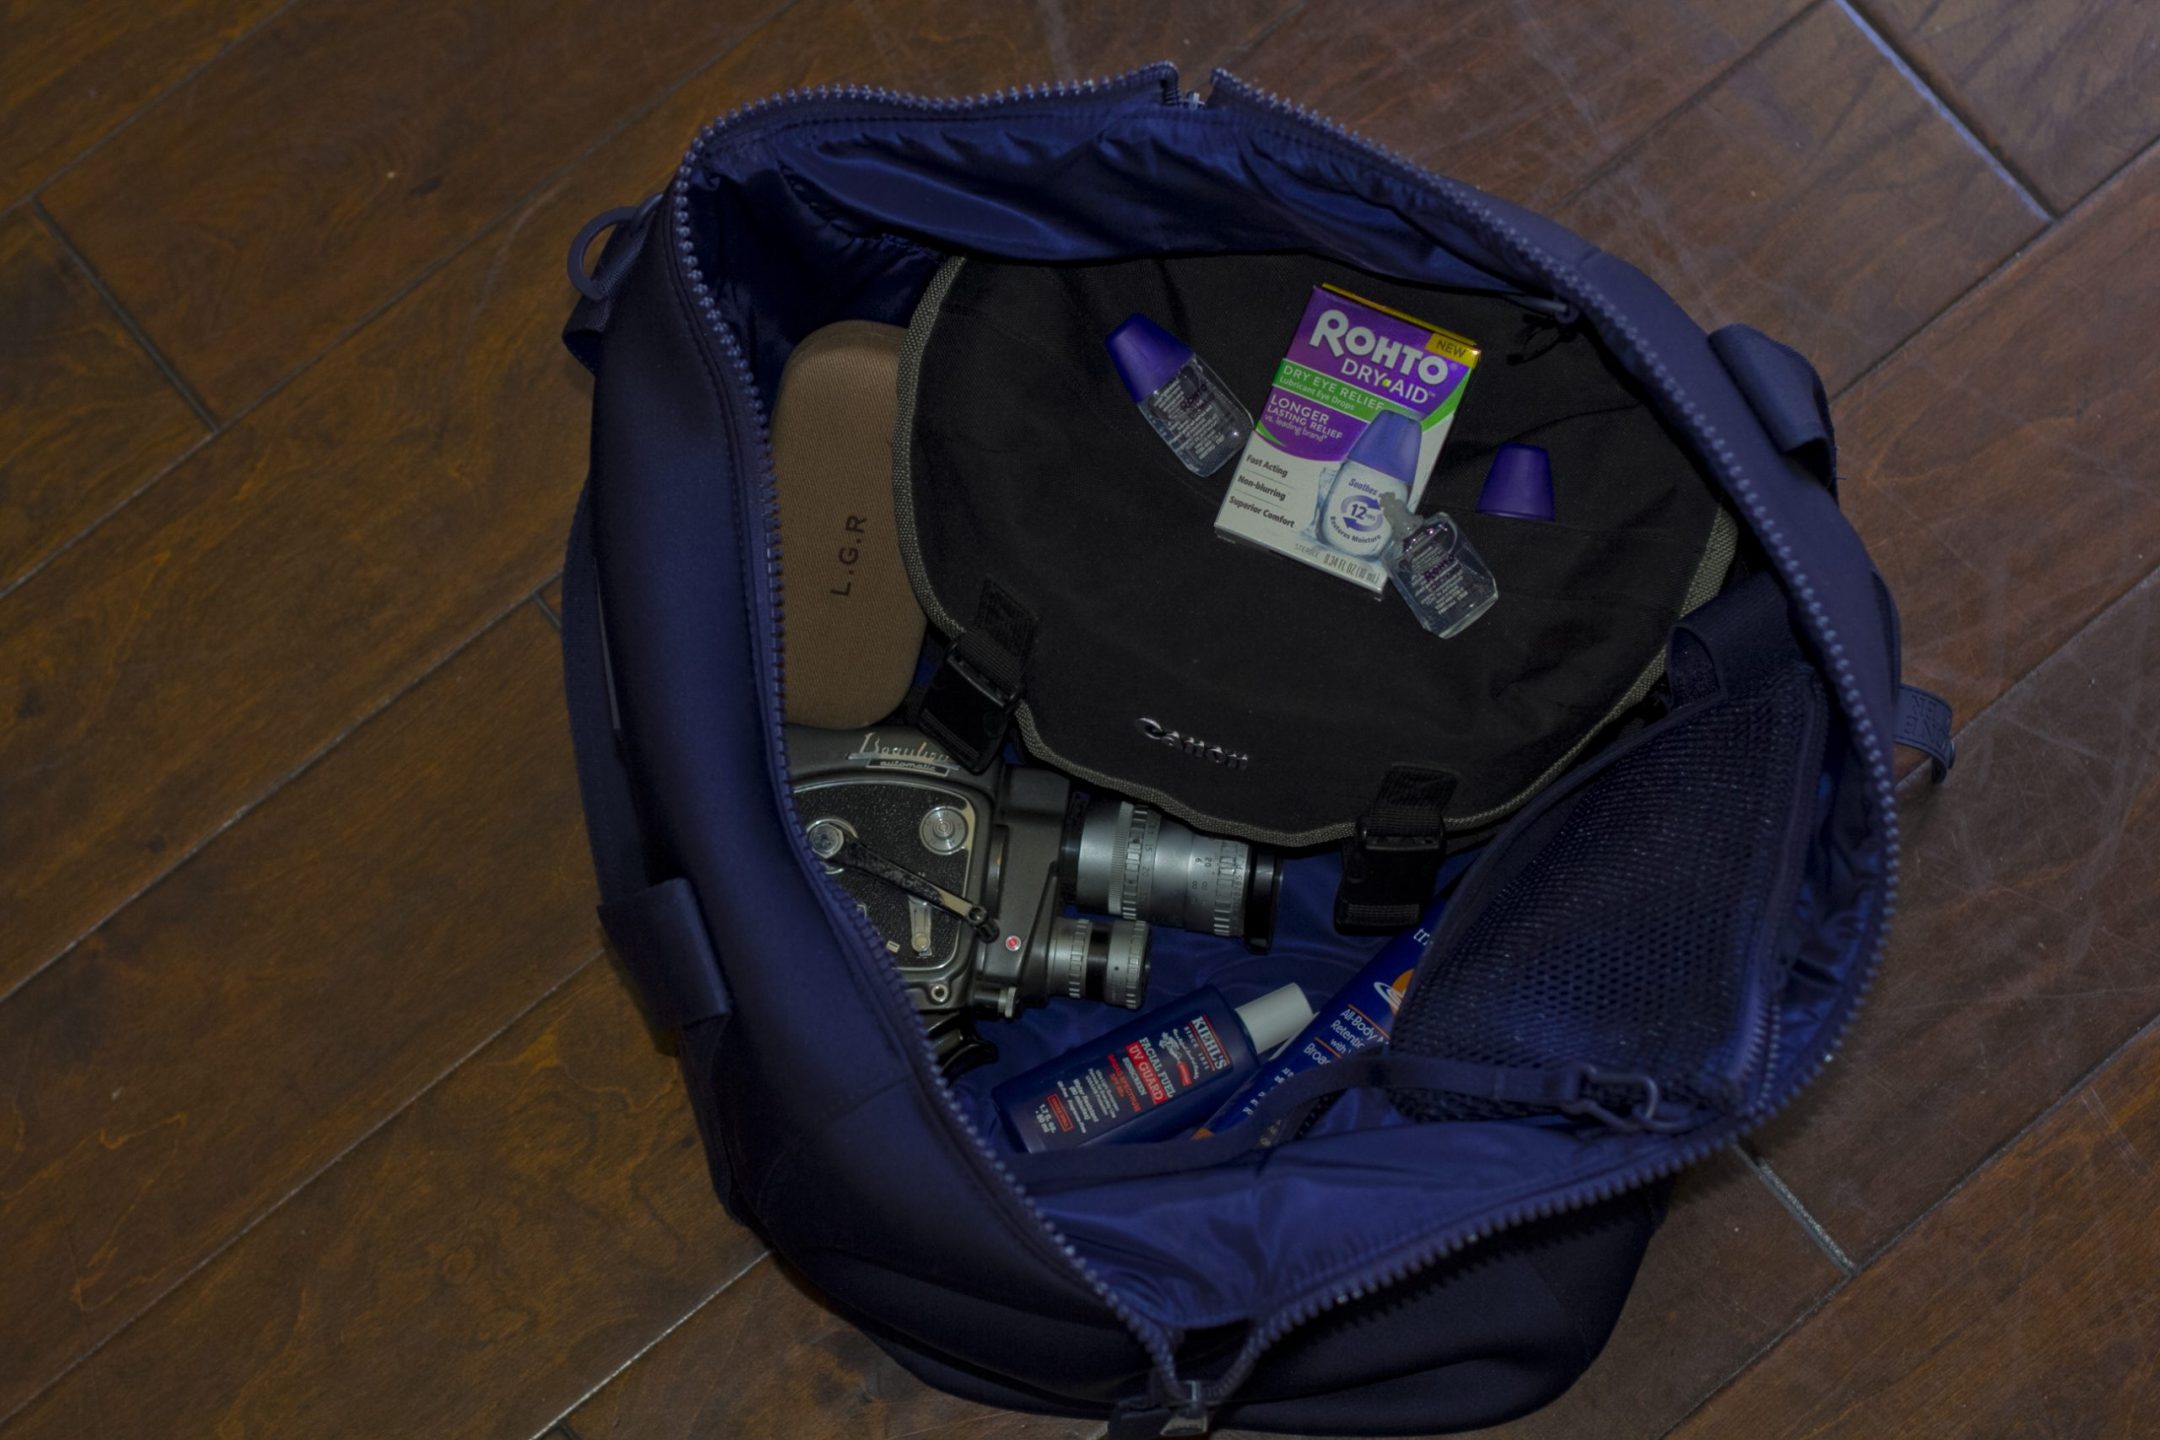 My Road Trip Essentials Bag